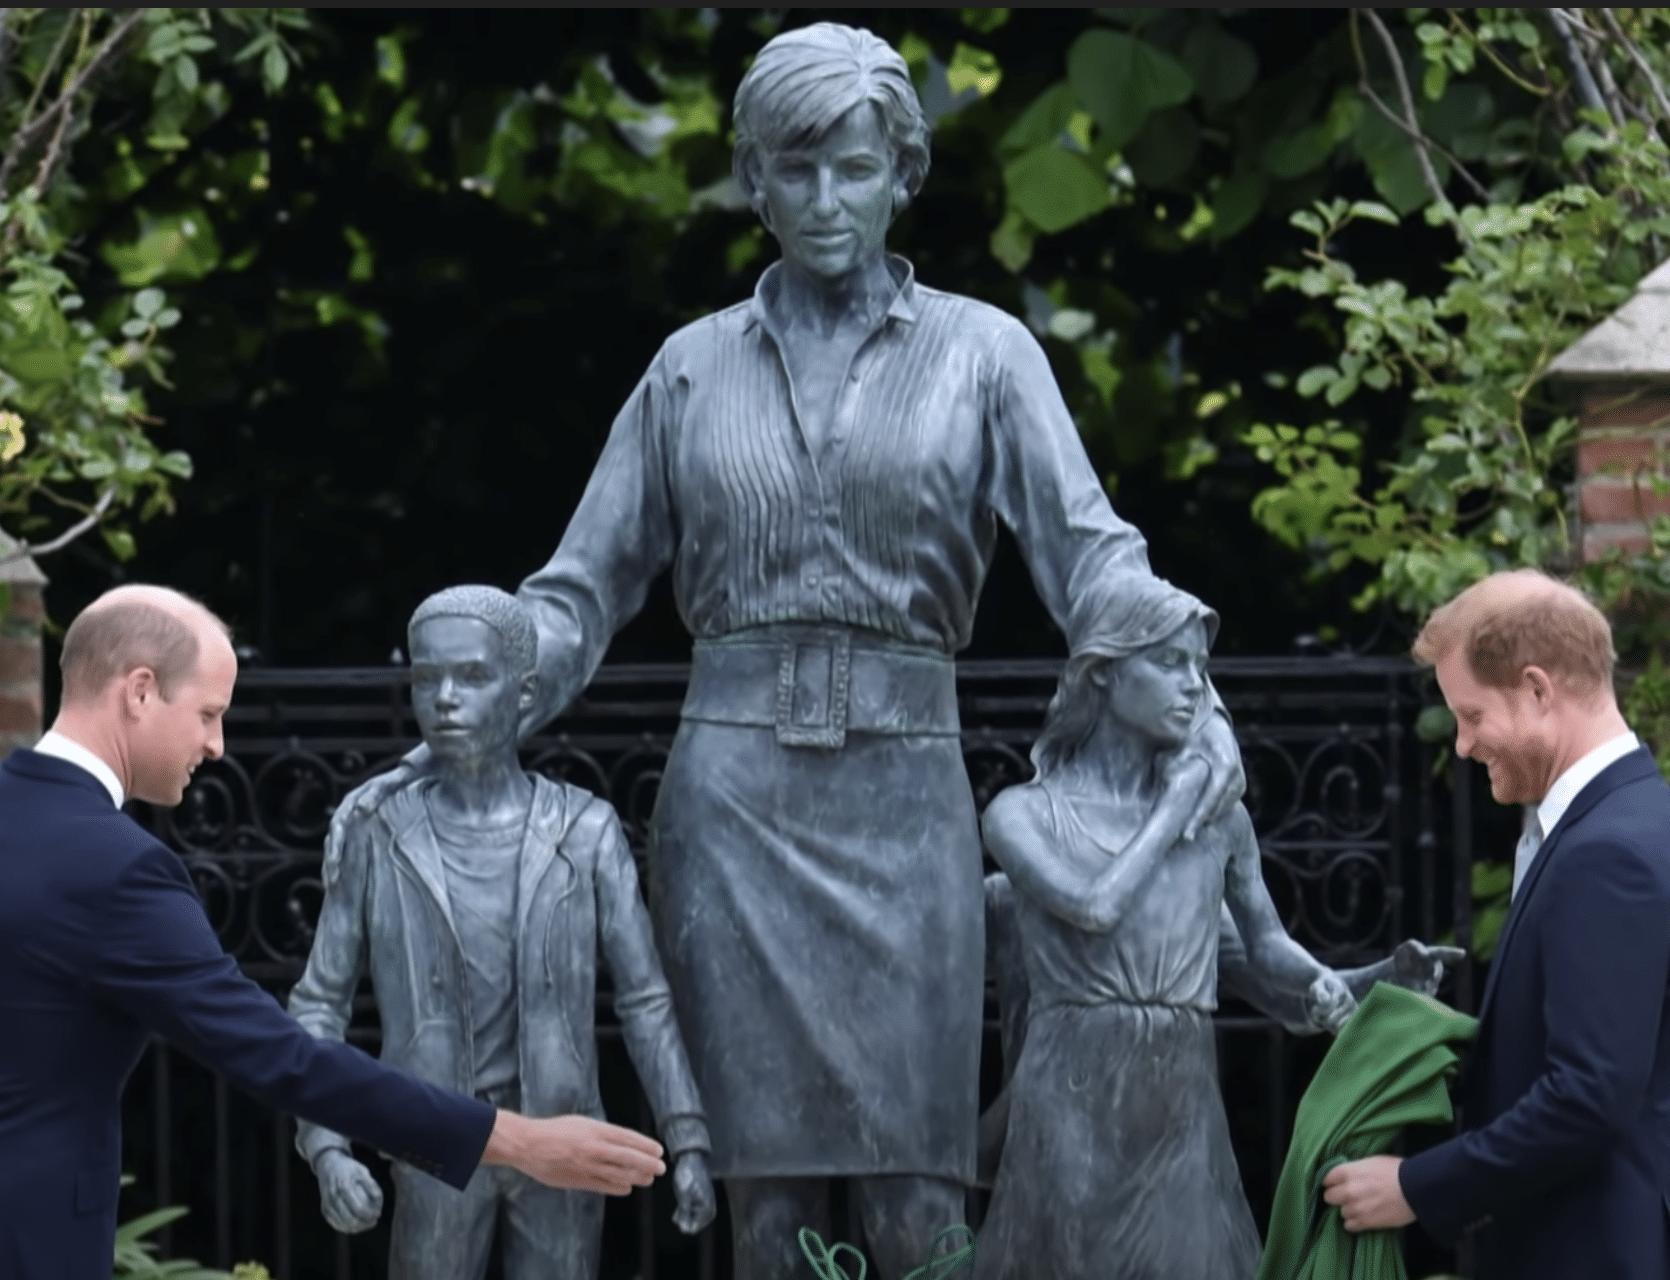 Prince William and Harry unveil statue of Princess Diana